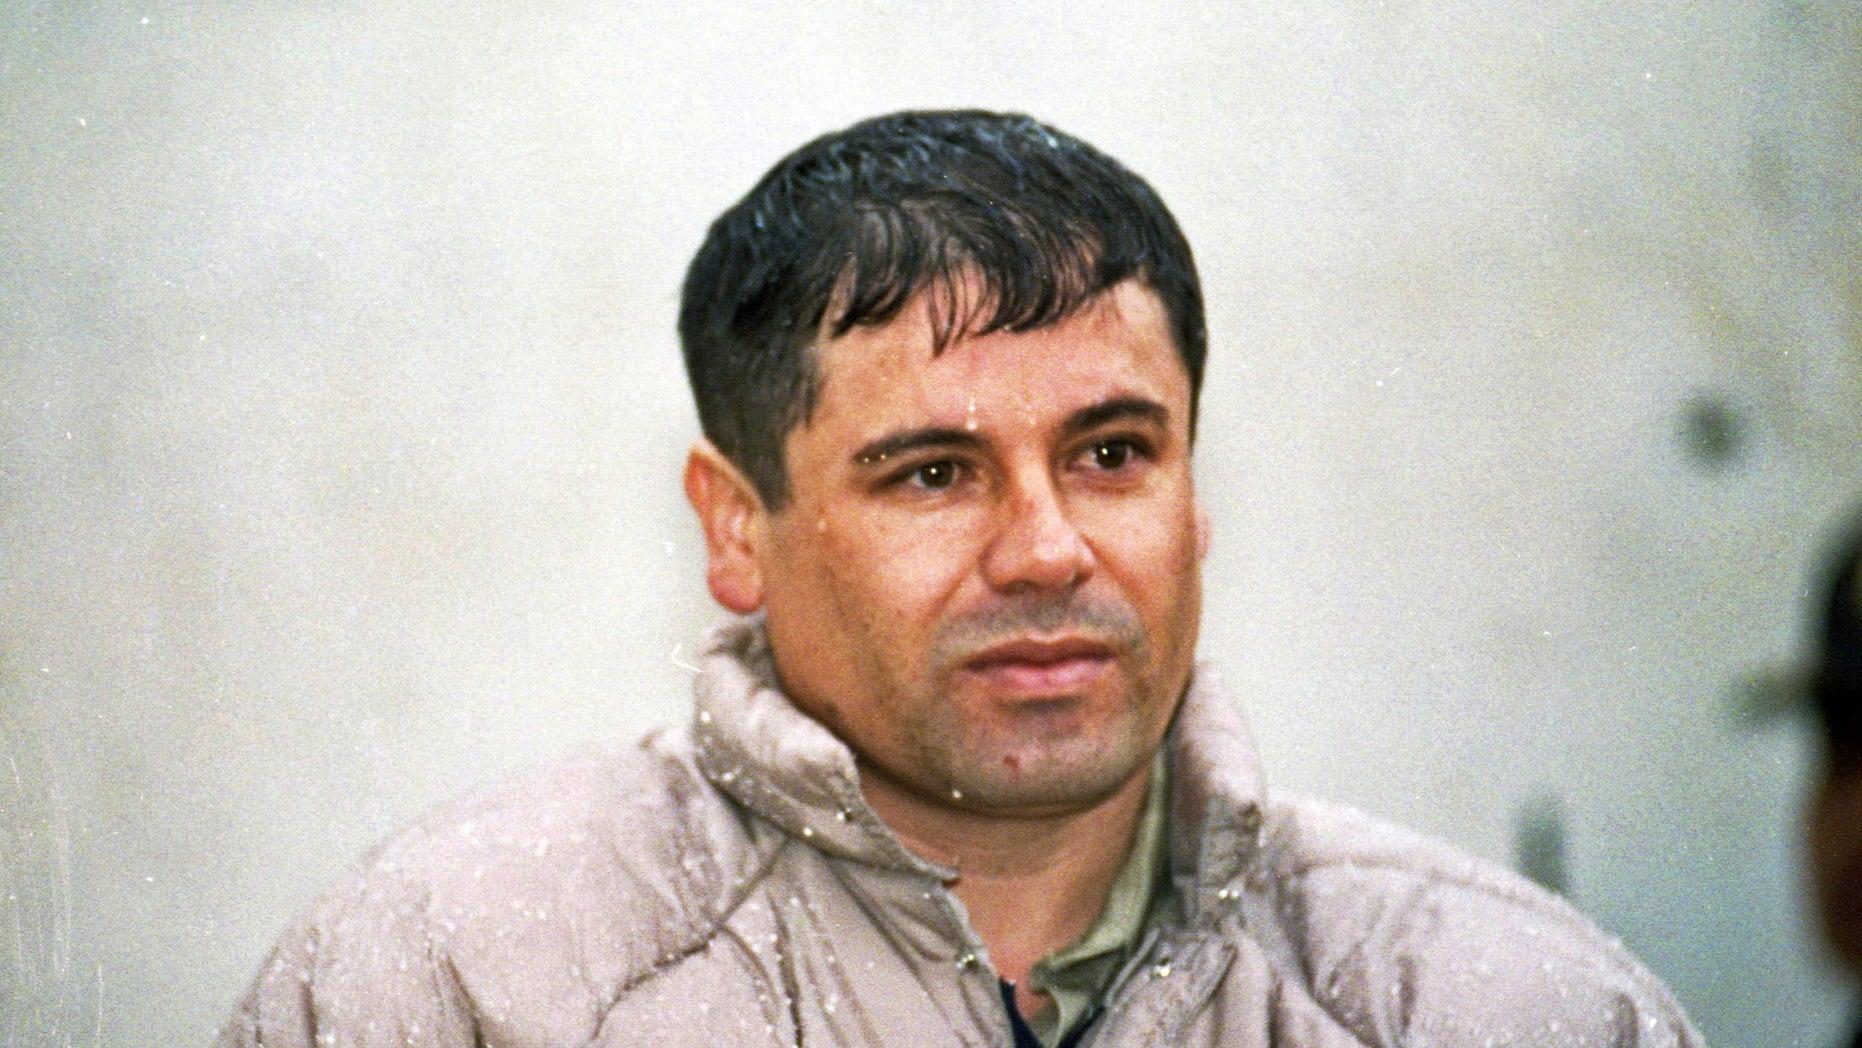 Joaquín 'El Chapo' Guzmán, leader of Mexico's Sinaloa cartel, in a June 10, 1993 file photo.